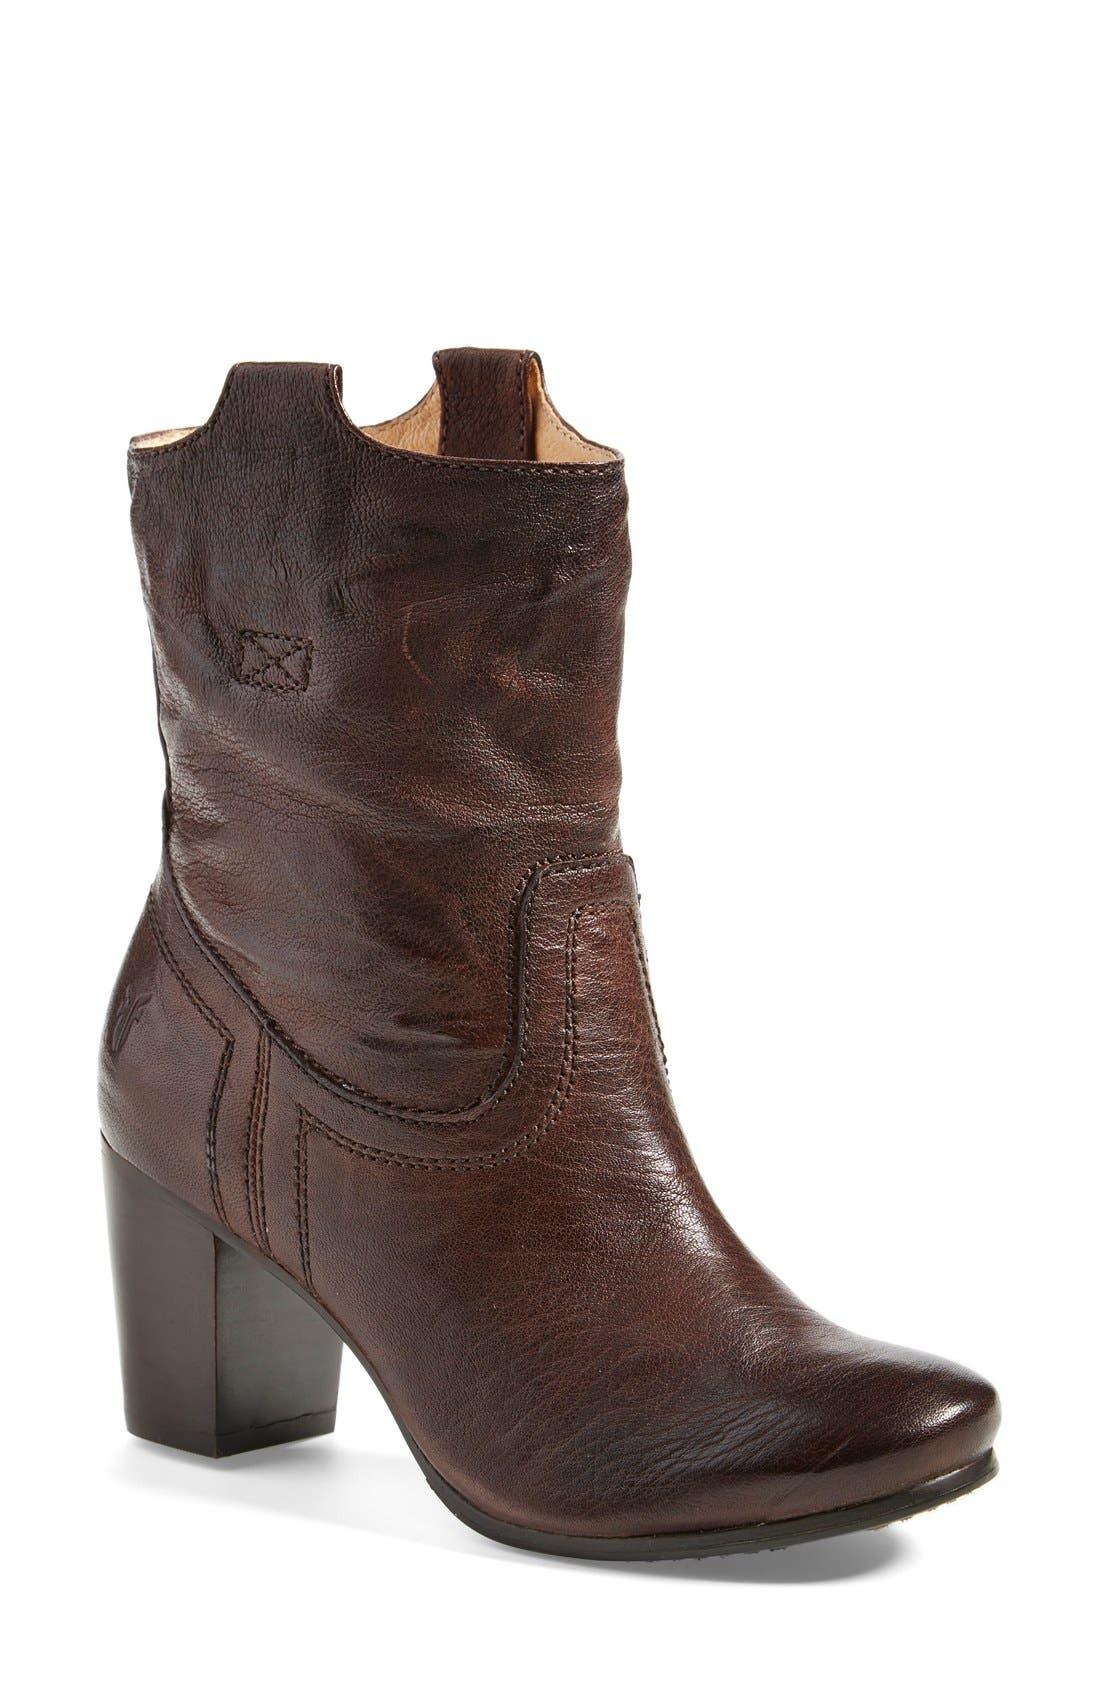 Main Image - Frye 'Carson' Mid Heel Tab Short Boot (Women)